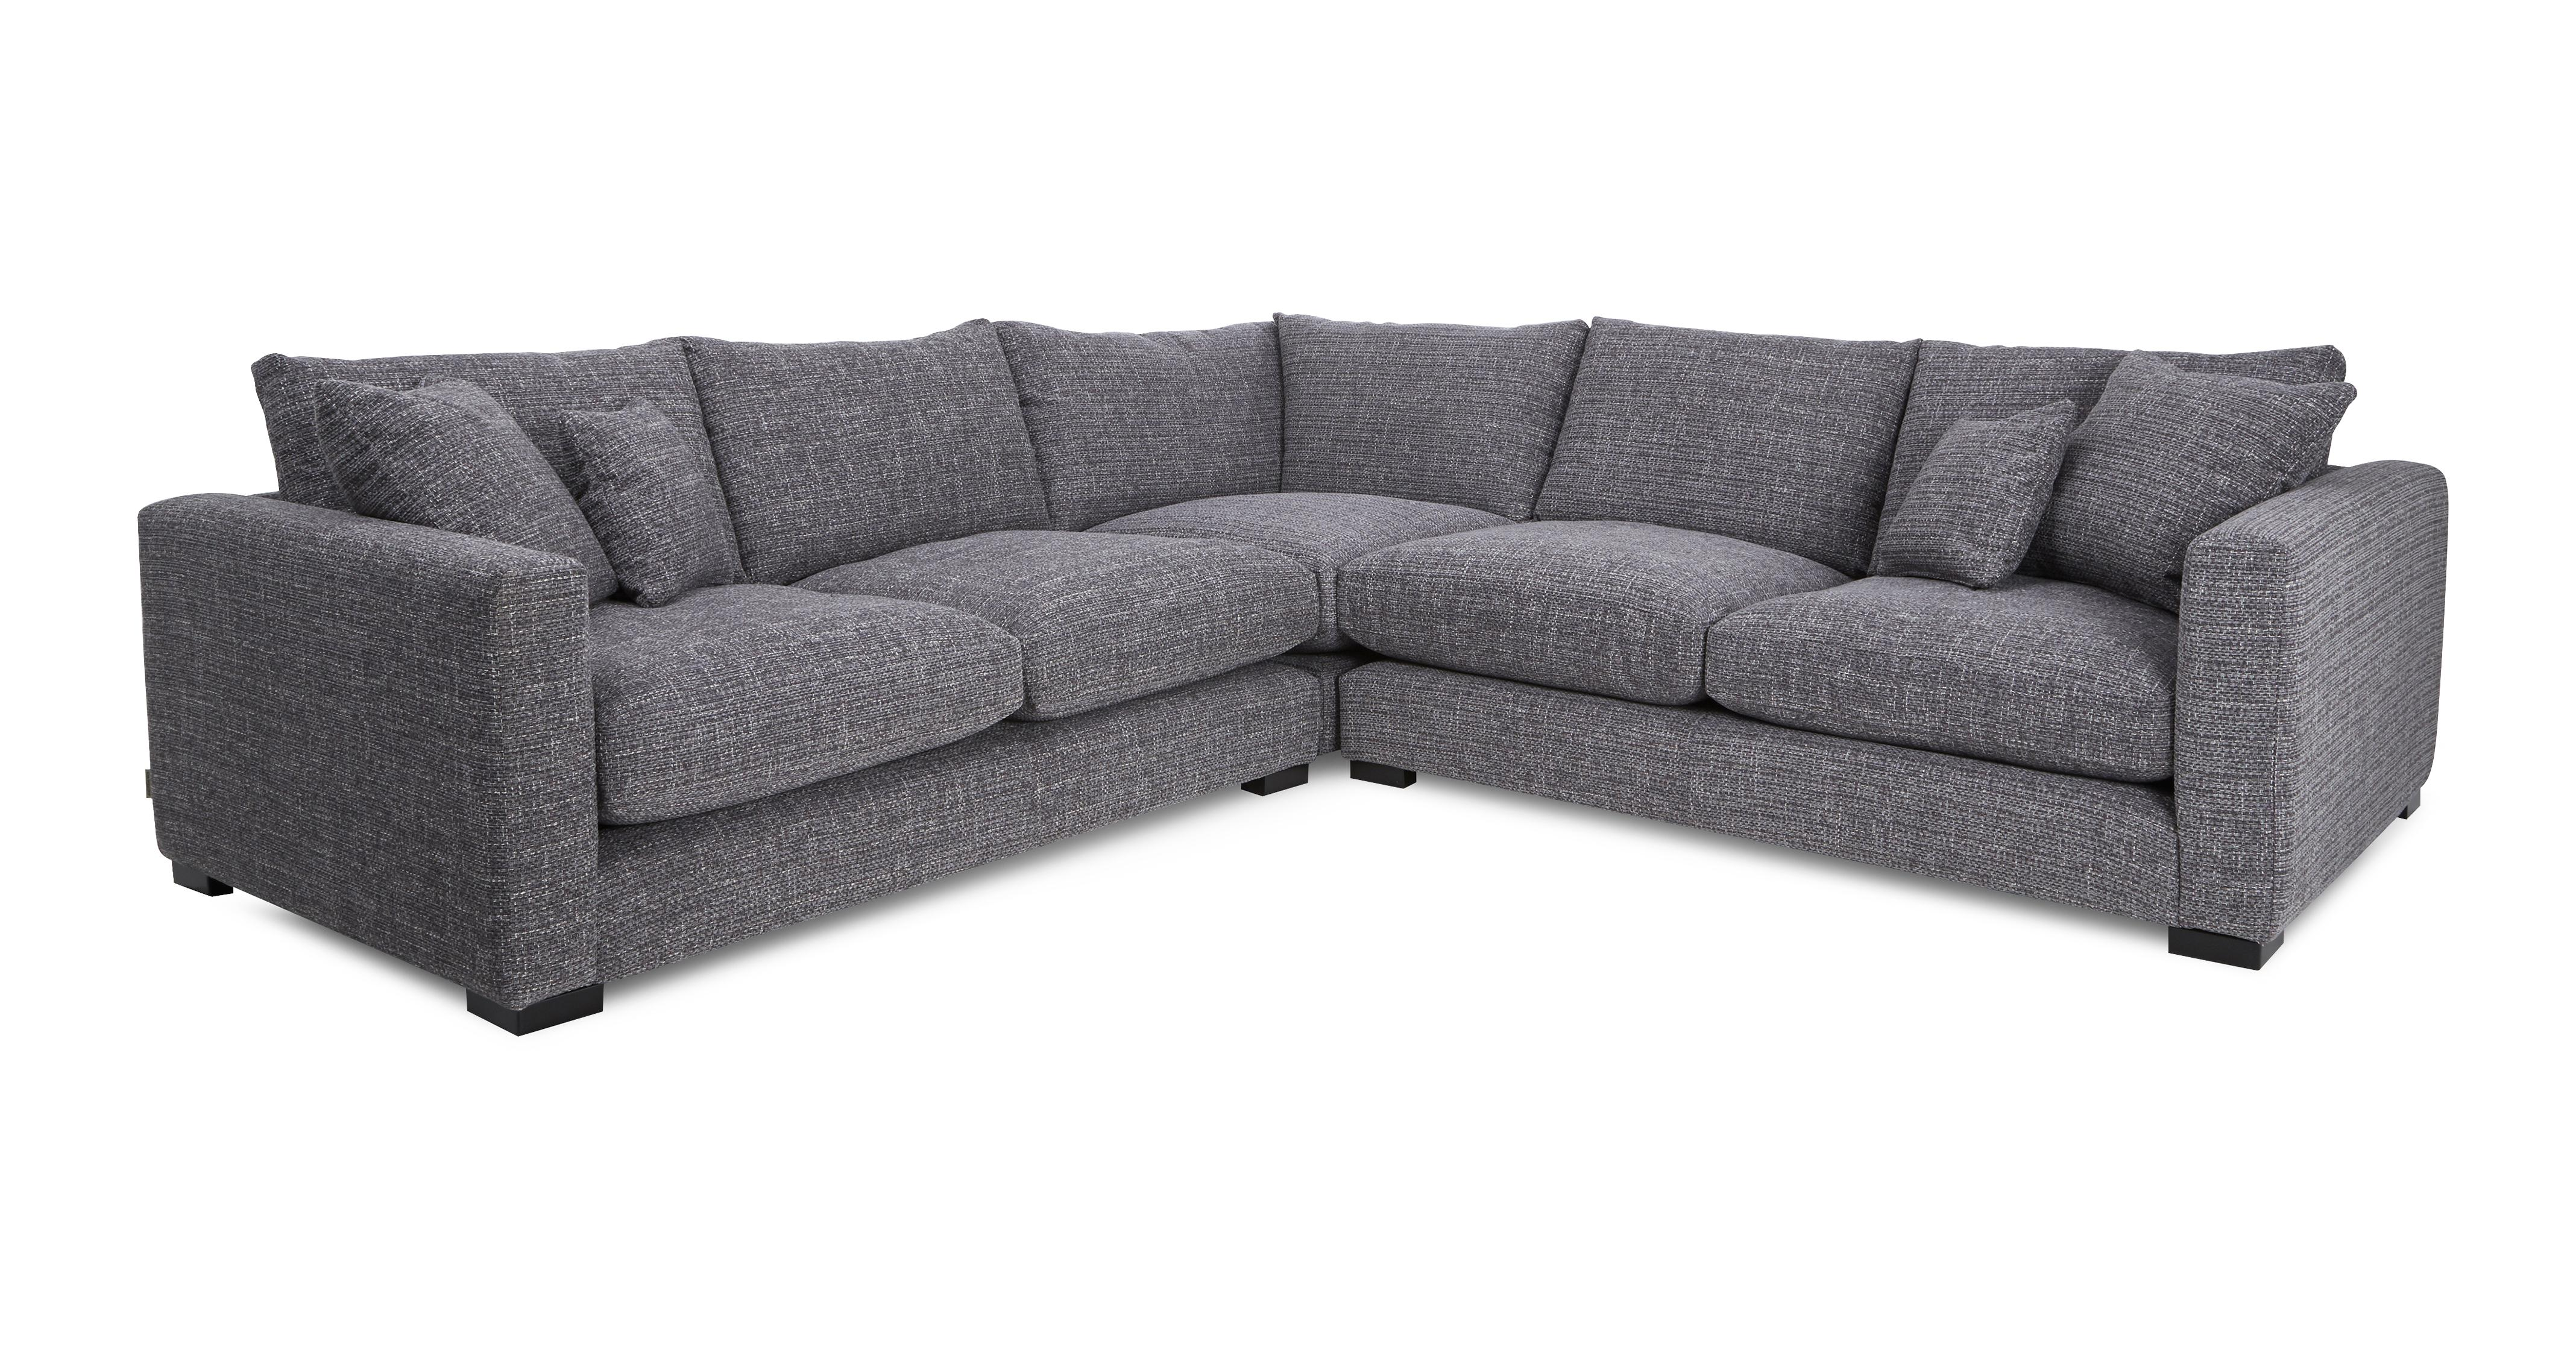 corner sofa bed fabric uk belgian shelter arm slipcovered restoration hardware dillon clearance small and large storage